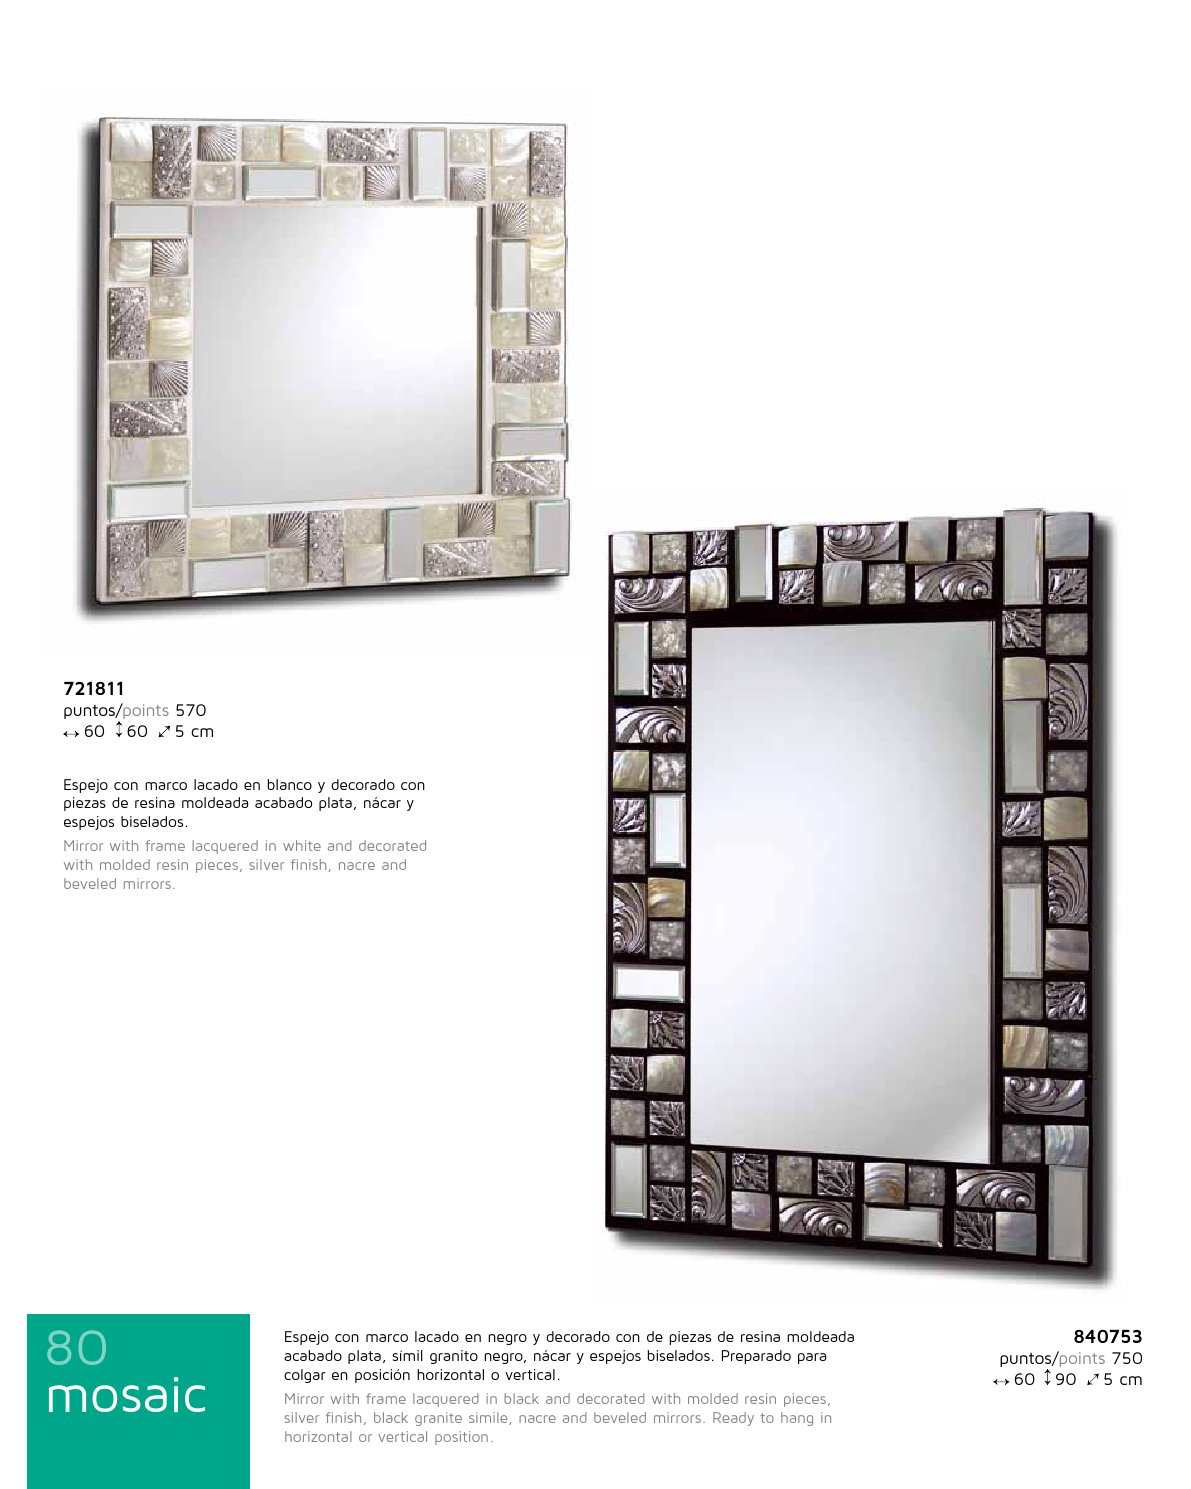 miroir 120x80. Black Bedroom Furniture Sets. Home Design Ideas